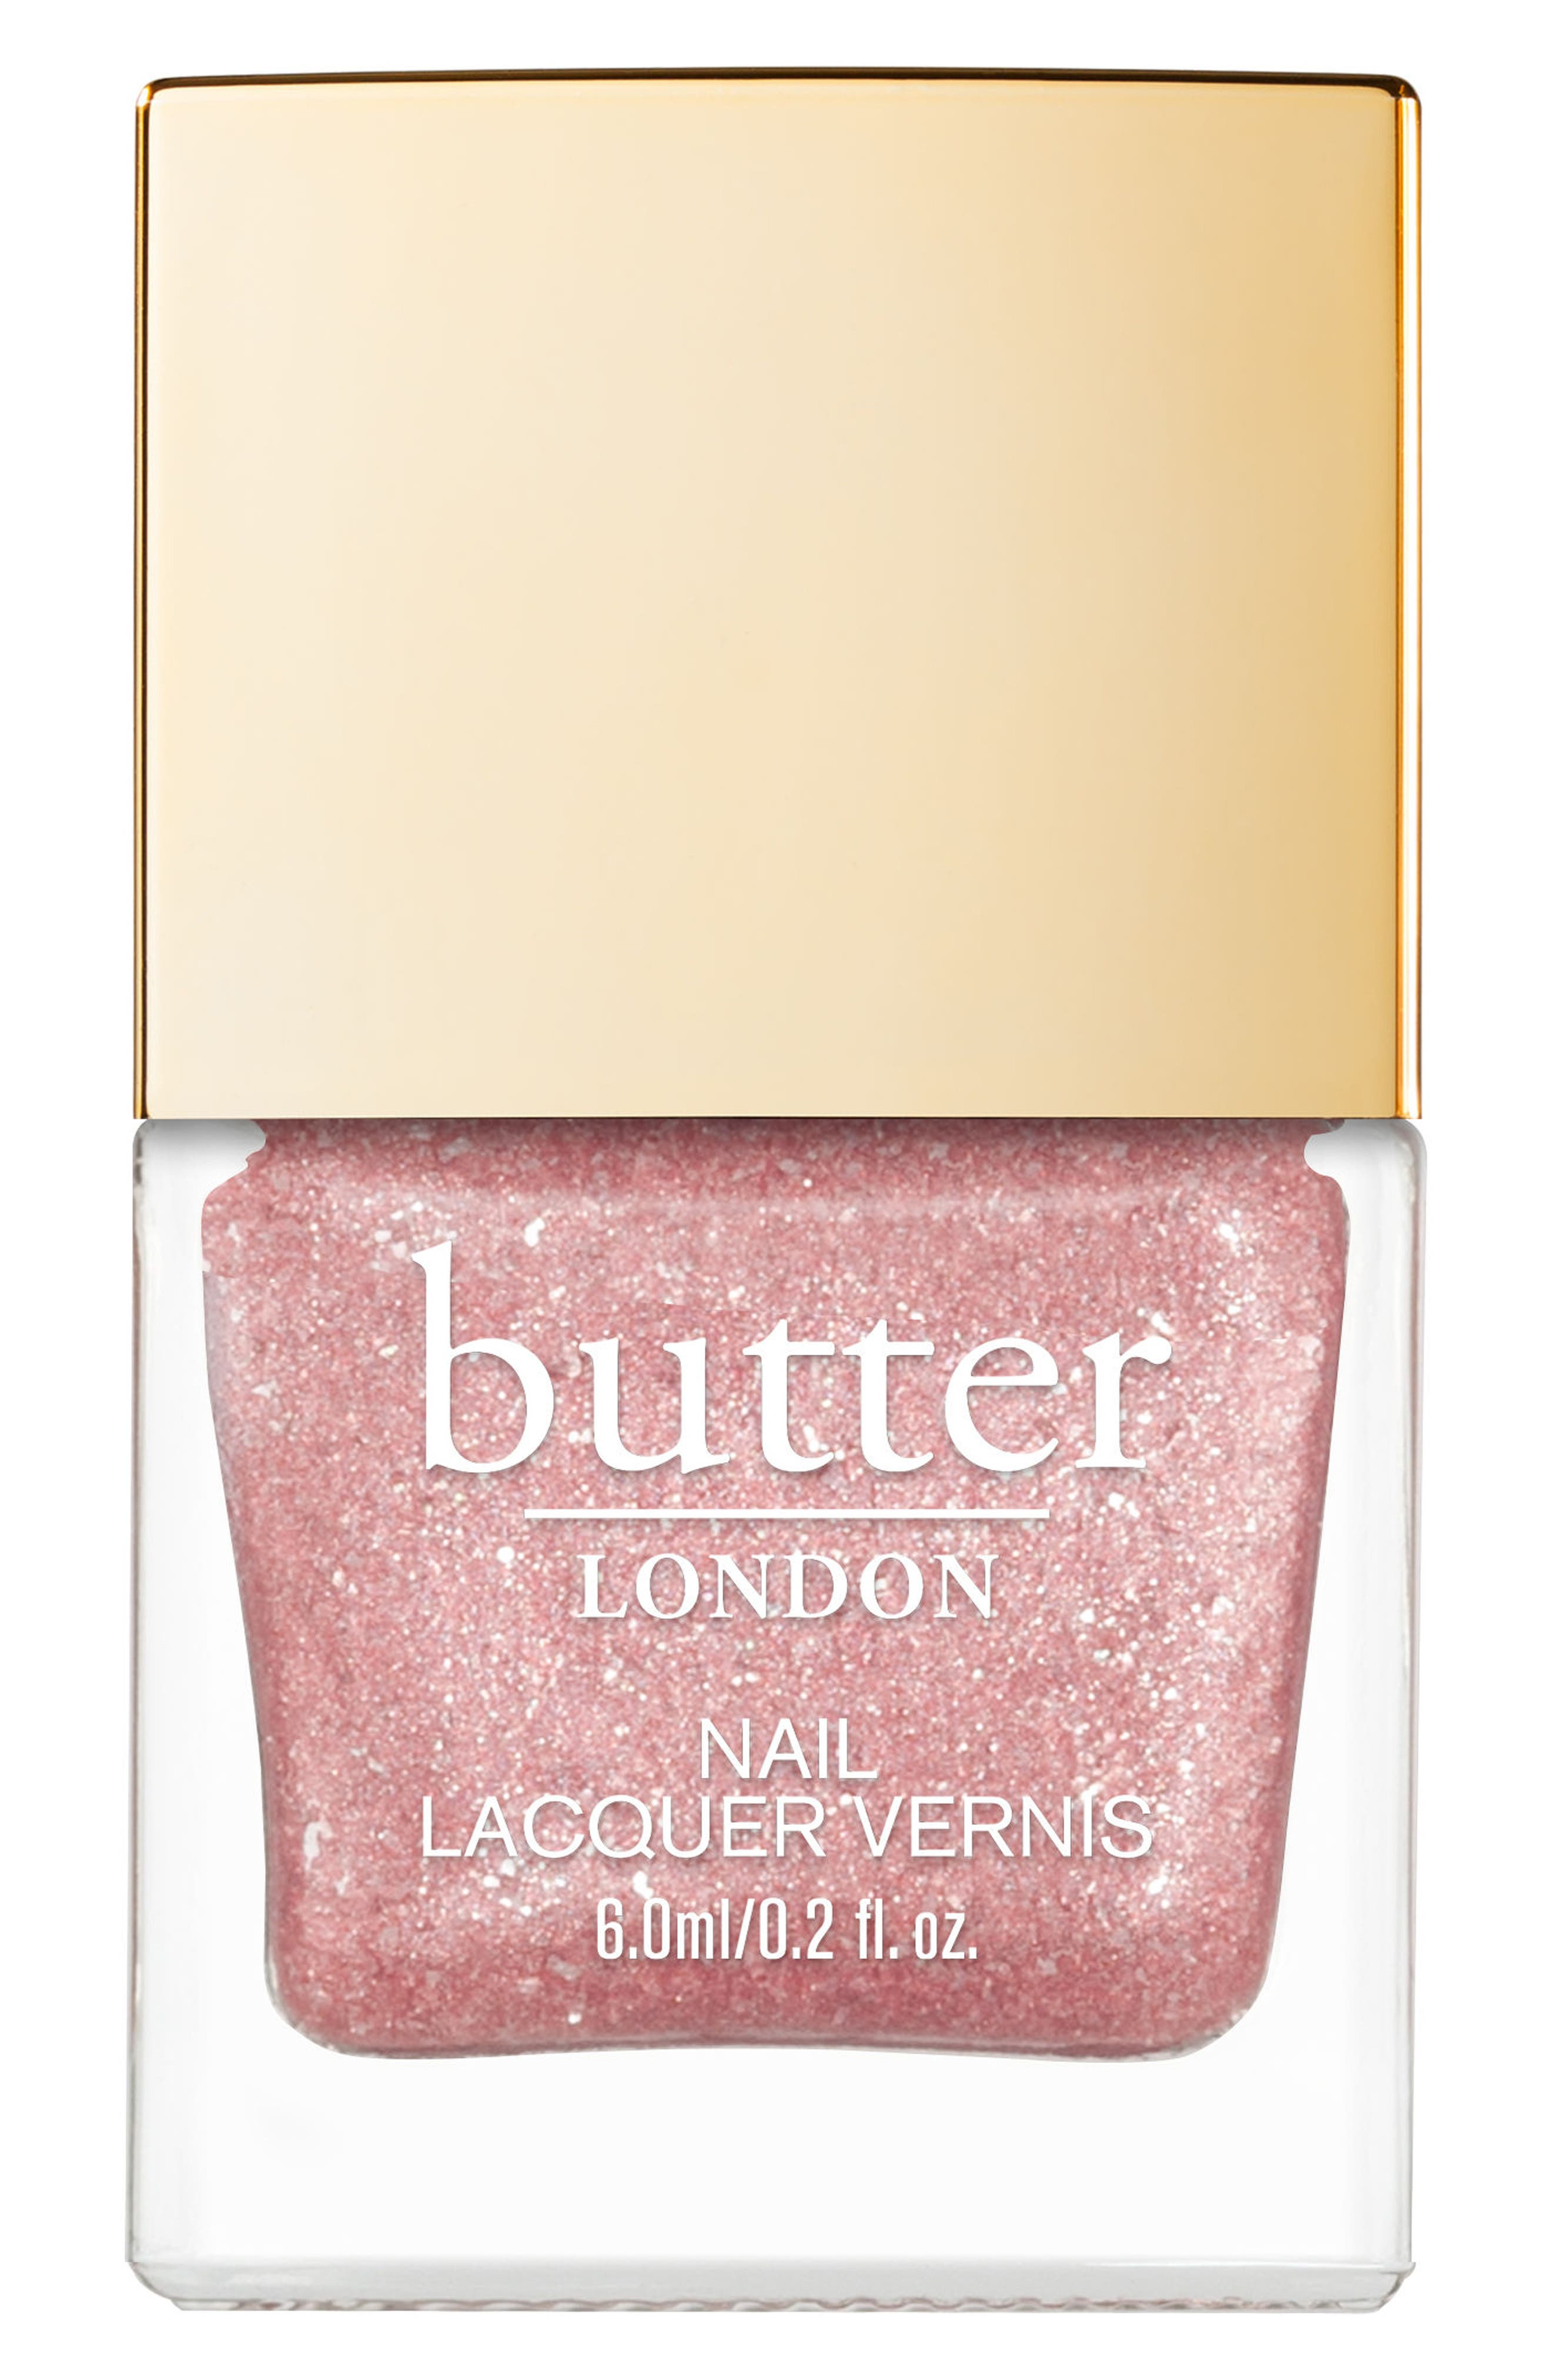 butter LONDON Mini Glazen Nail Lacquer (Limited Edition)